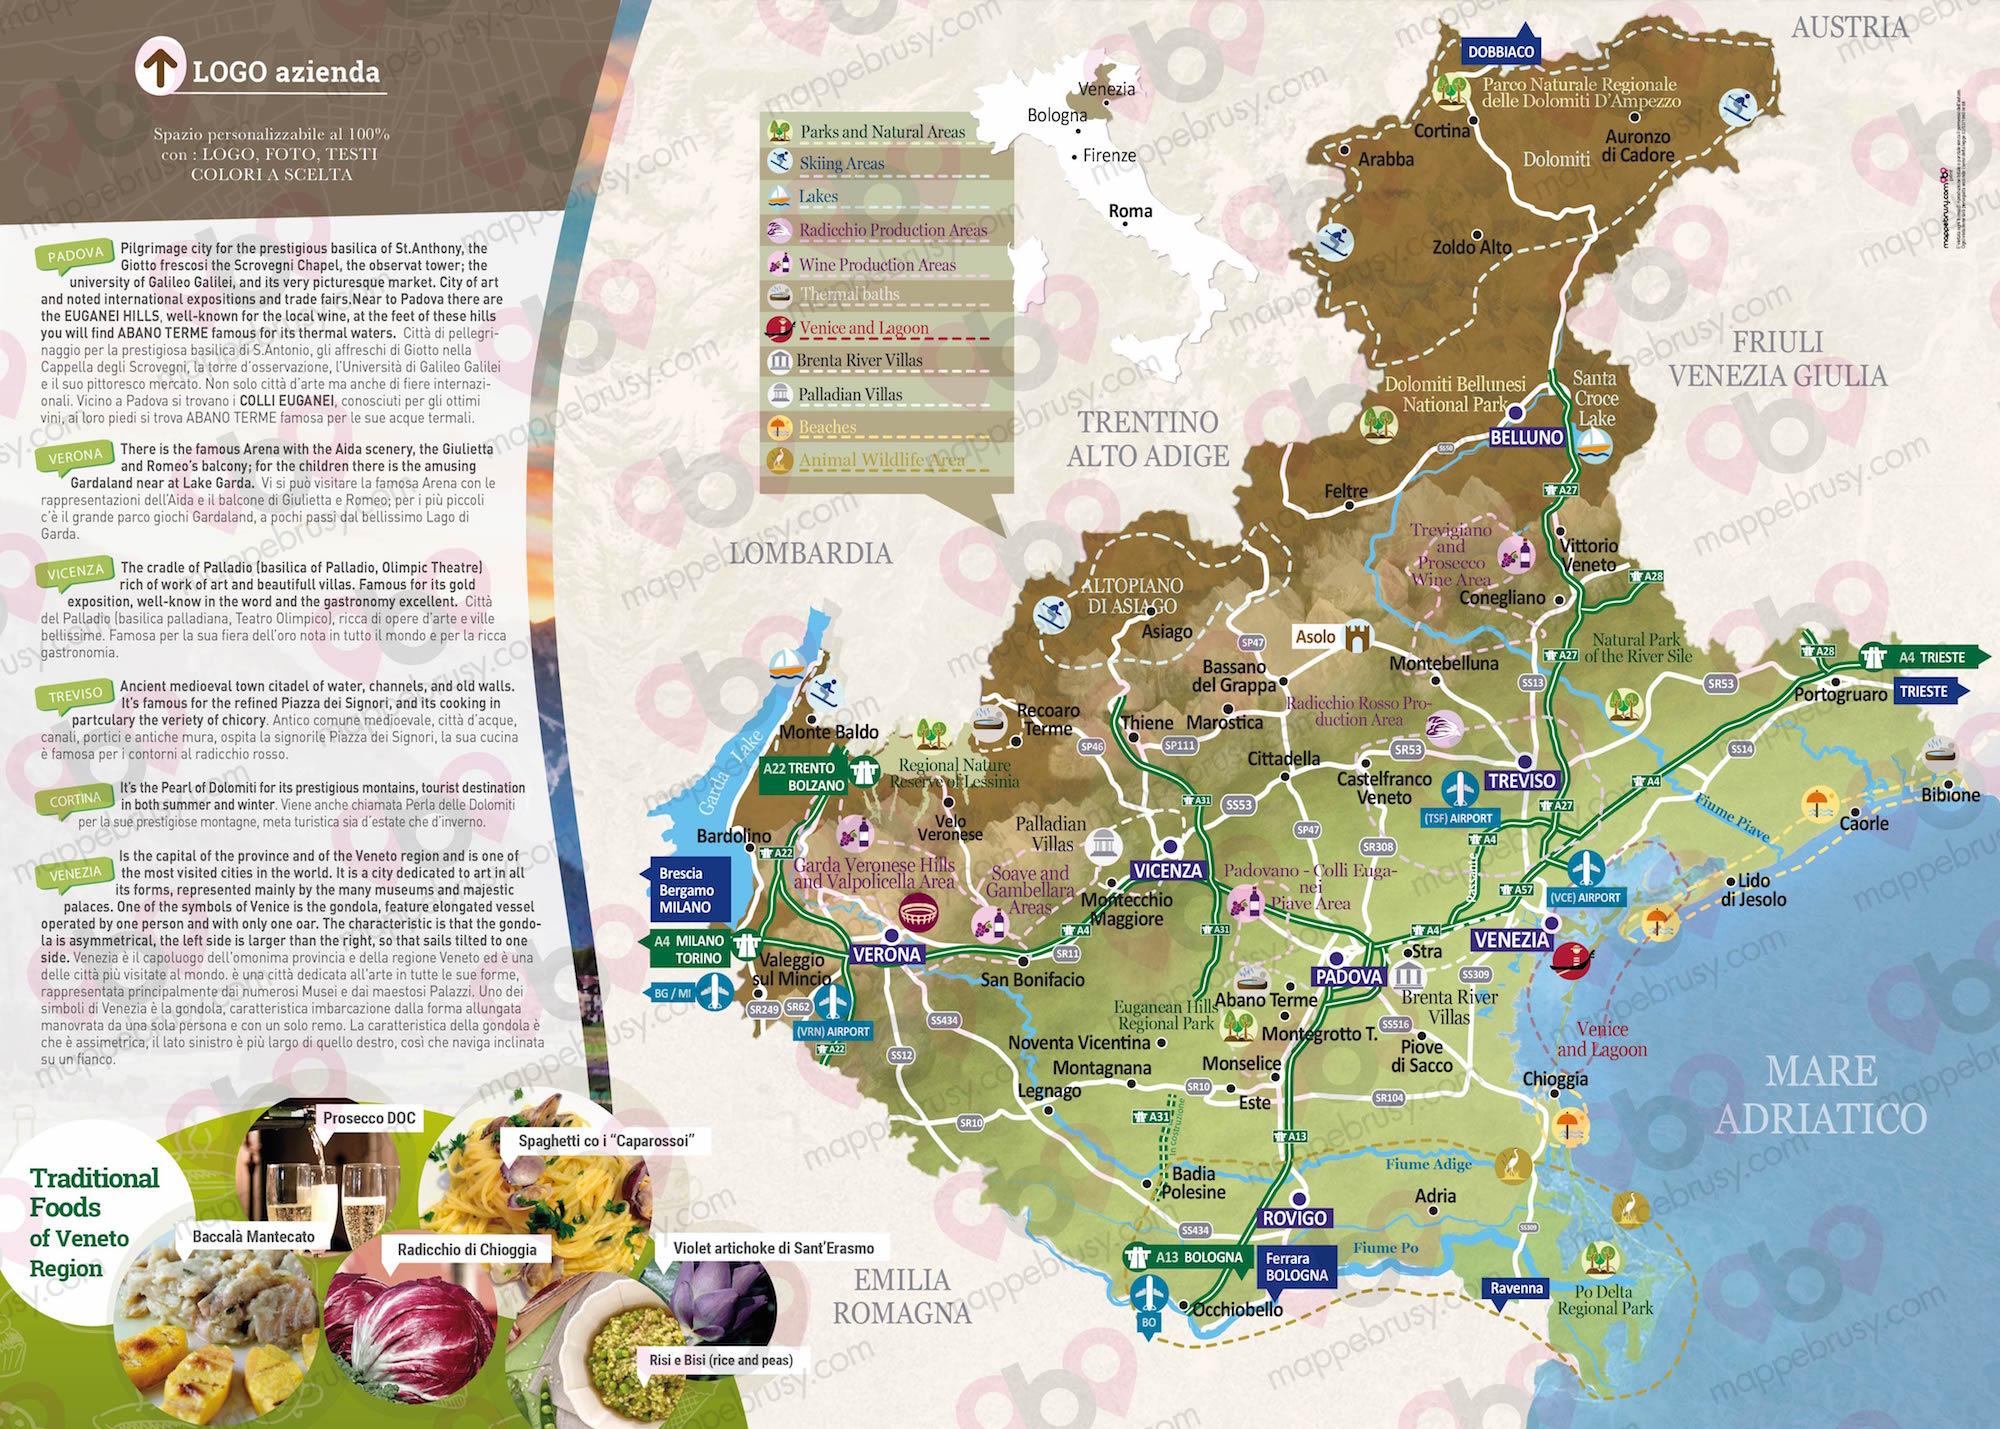 Veneto Regione Cartina.Veneto Regione Mappe Brusy